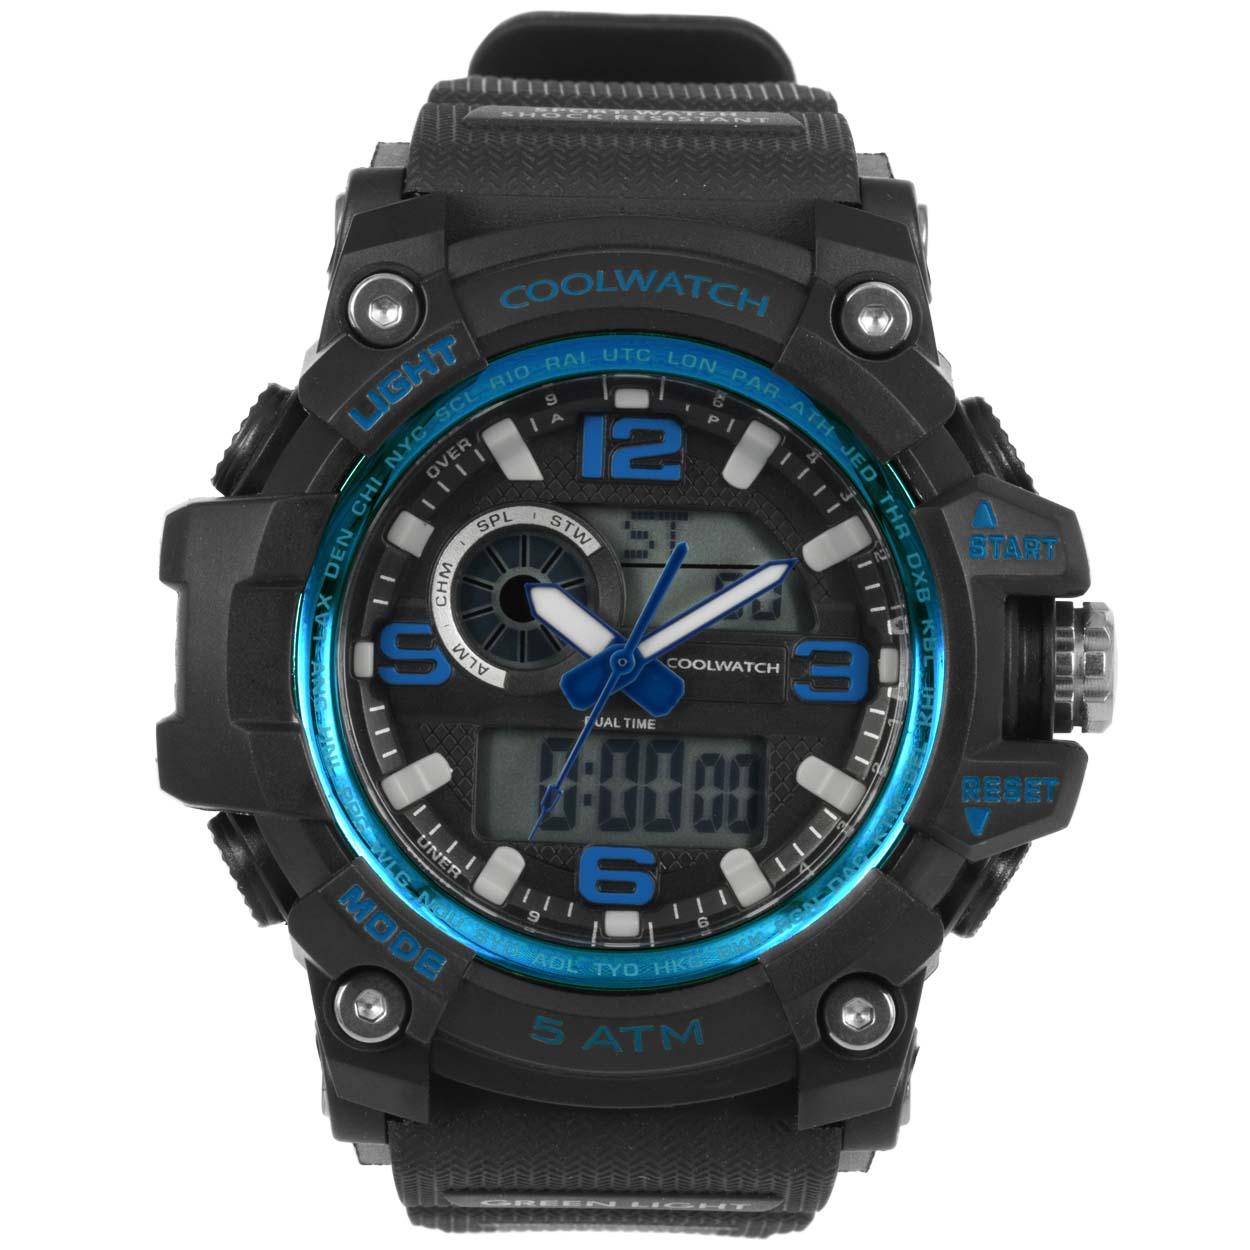 Coolwatch Herenhorloge CW.389 Plastic/silicone Kunststof